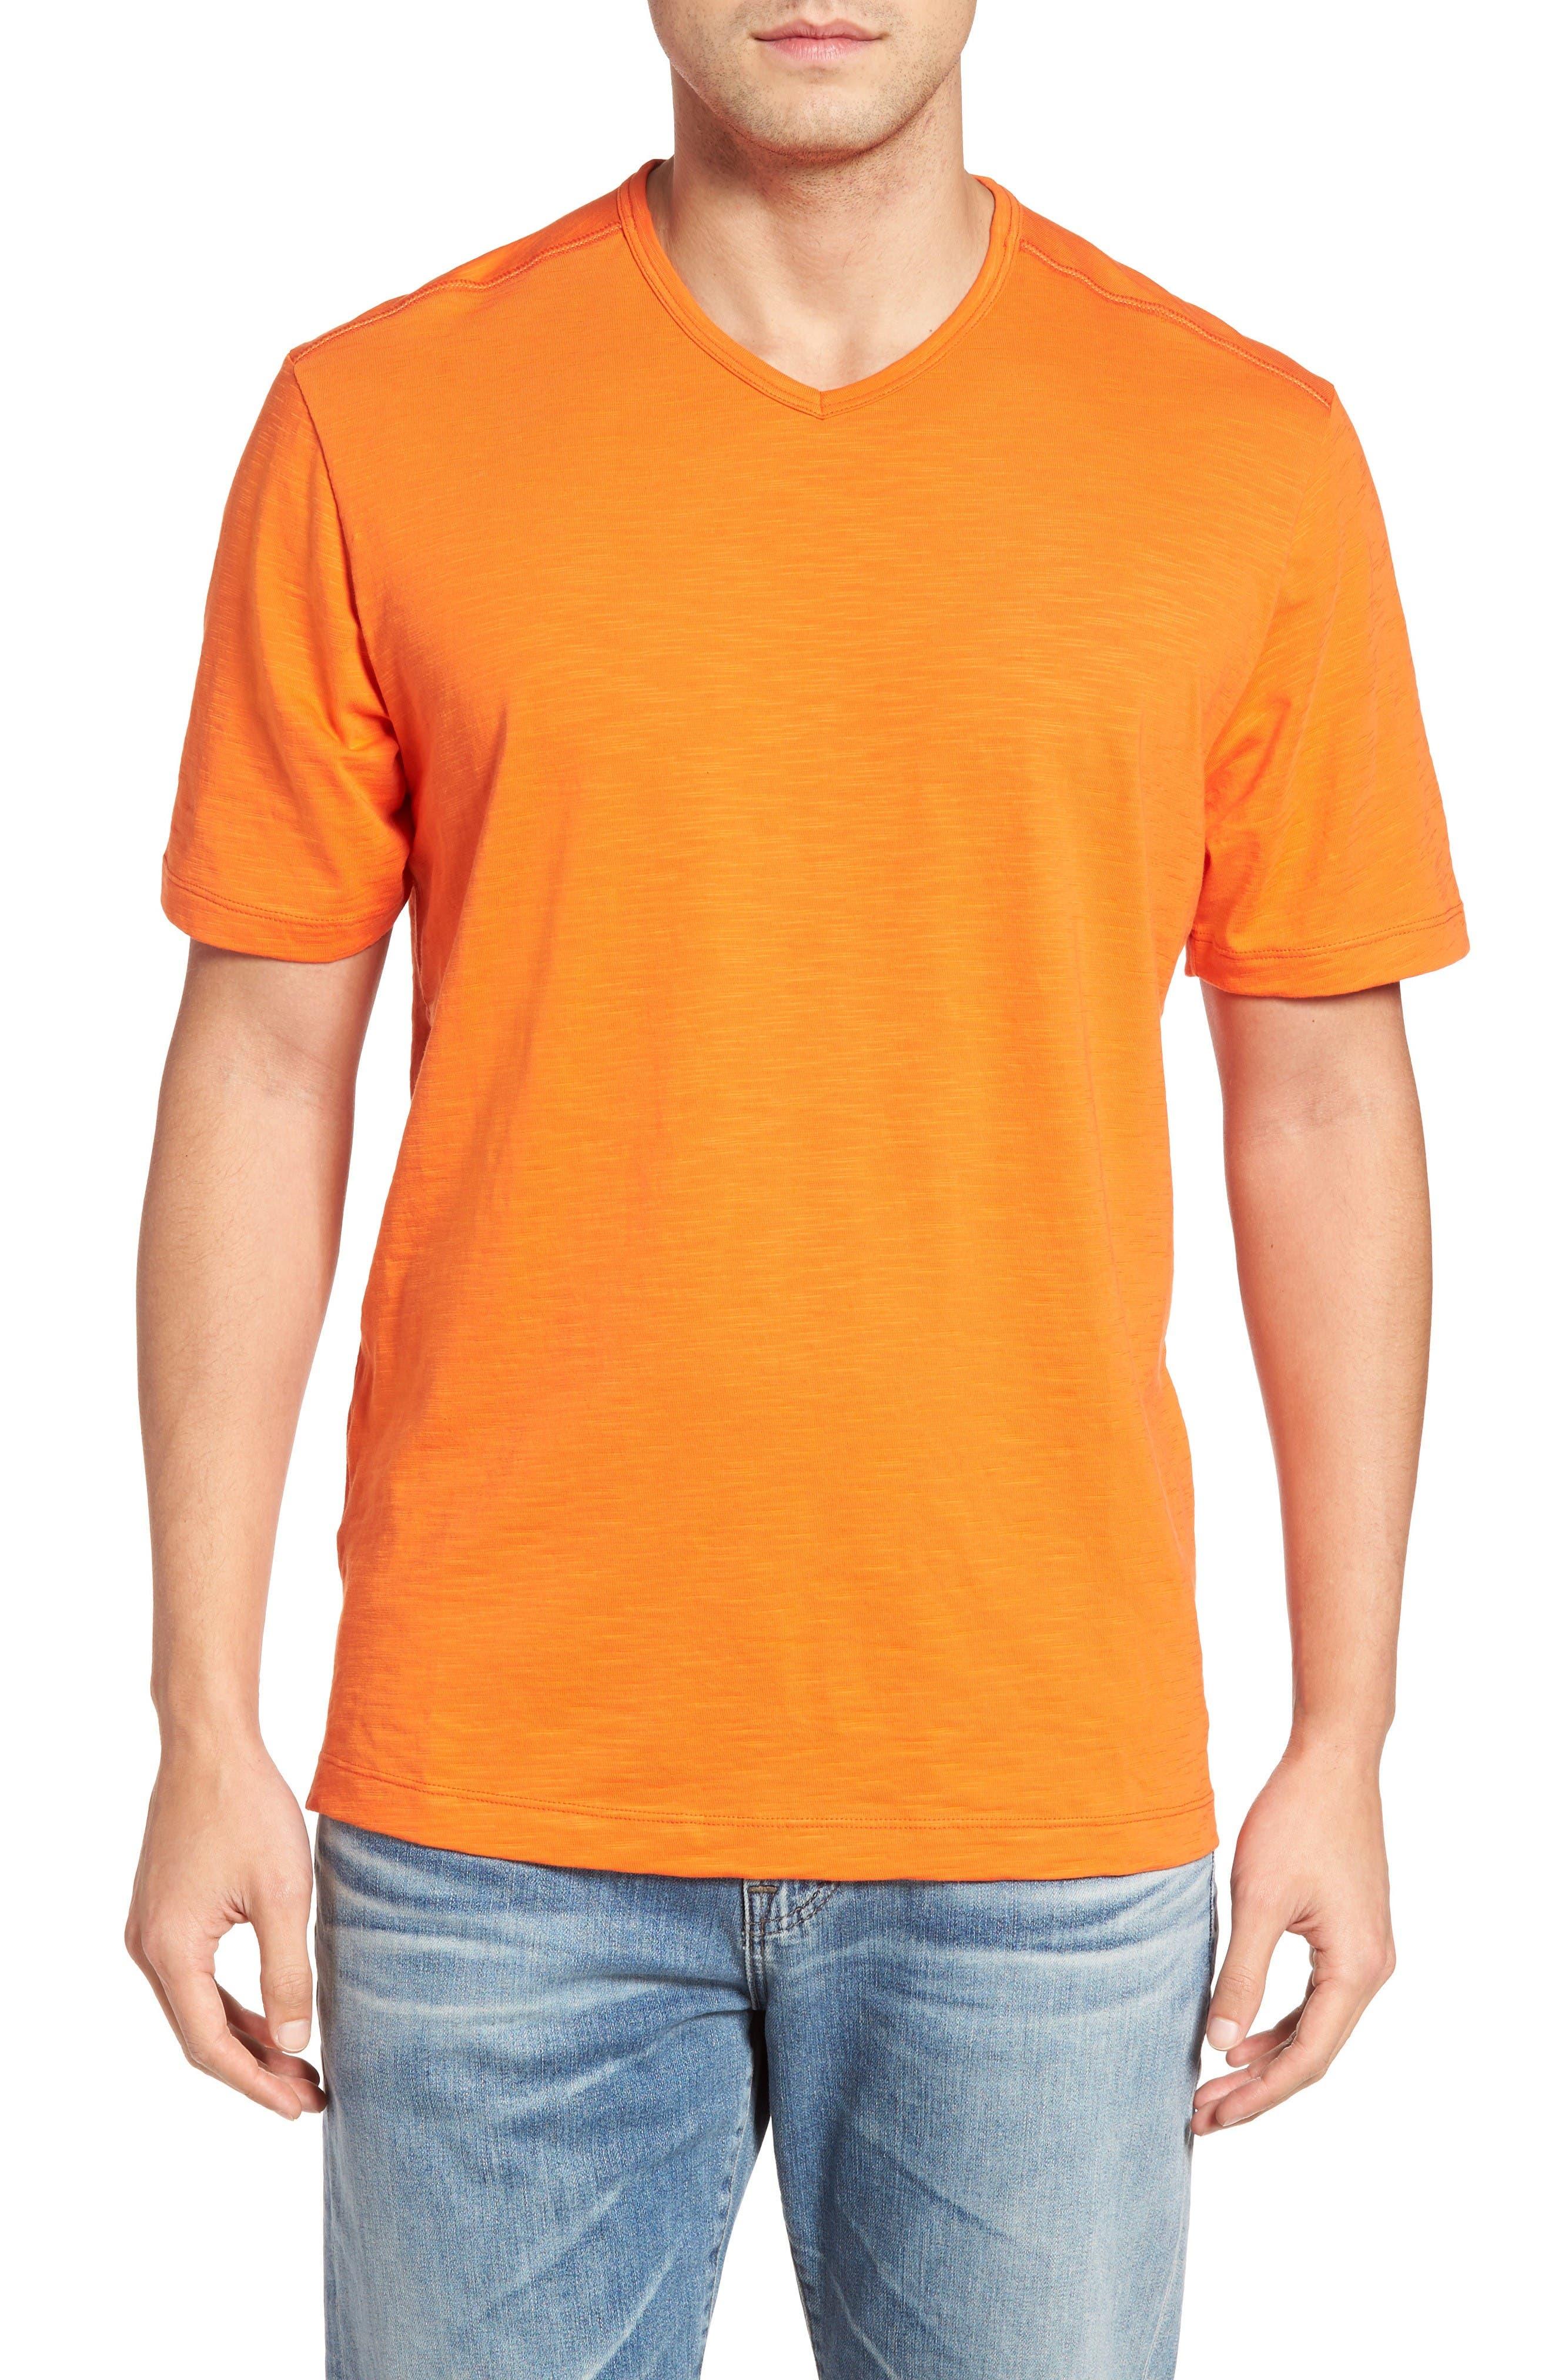 Alternate Image 1 Selected - Tommy Bahama 'Portside Player' Pima Cotton T-Shirt